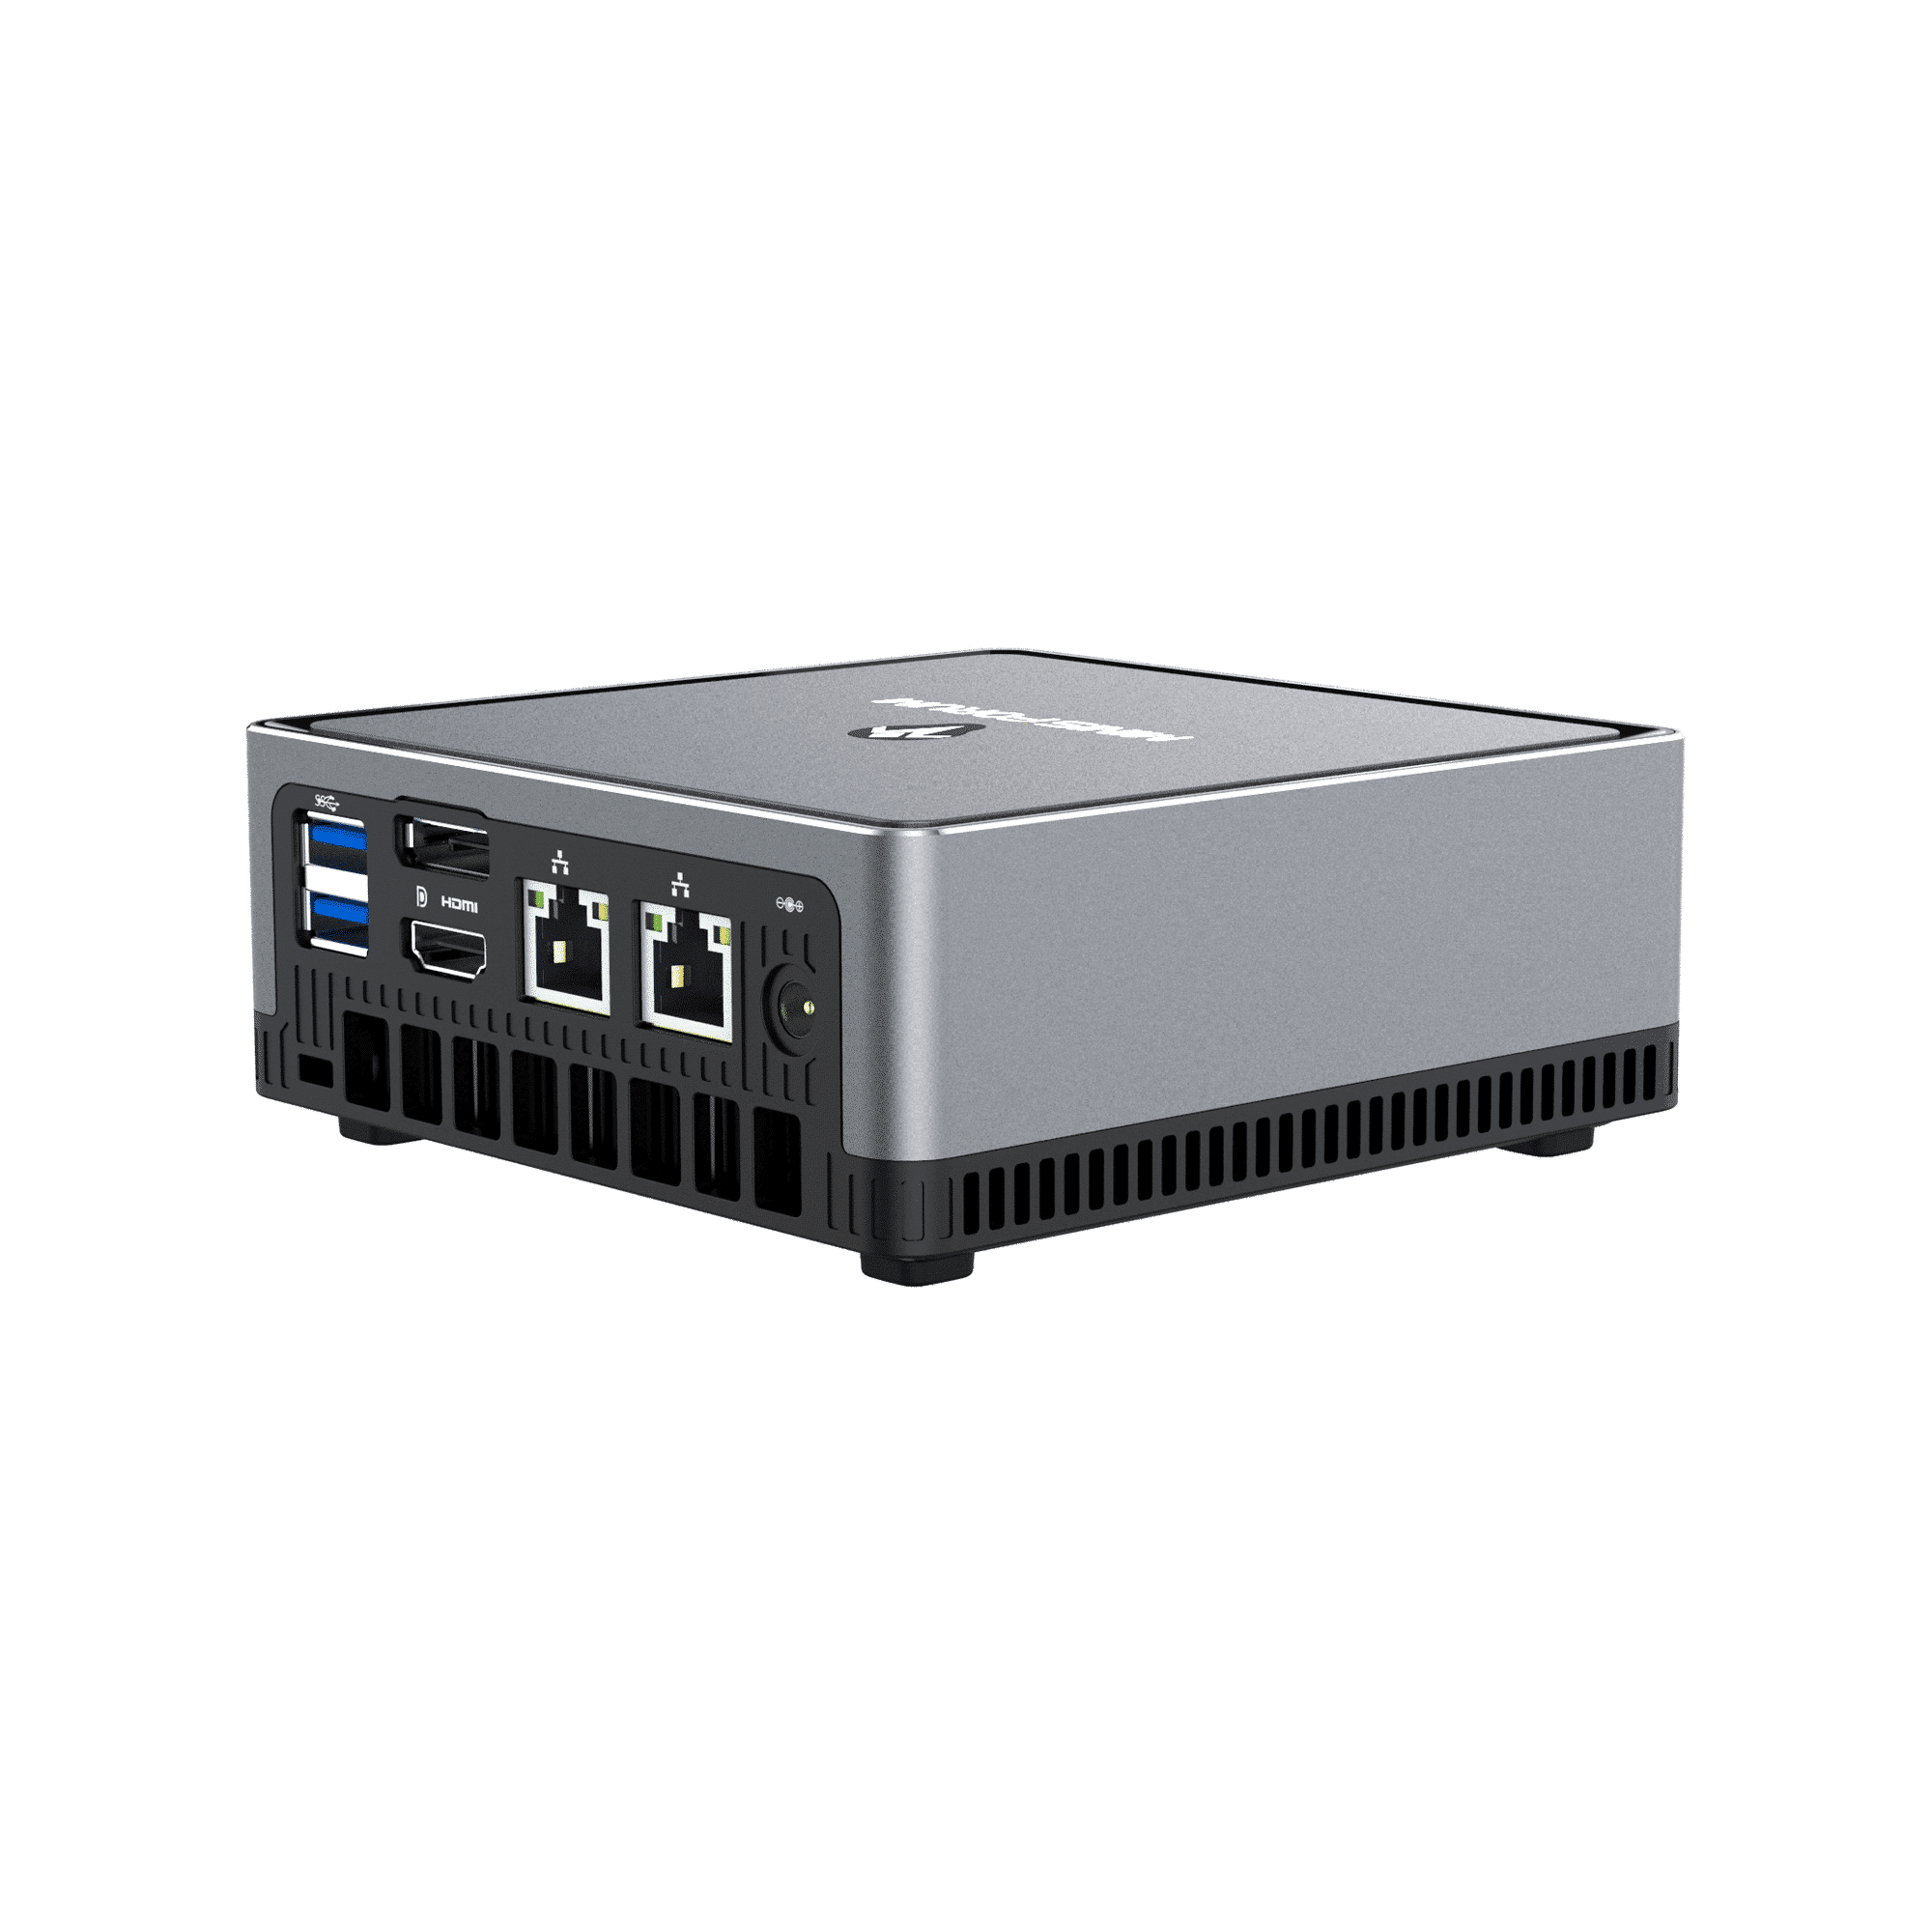 MinisForum EliteMini UM700 - Showing from the back at angle with I/O which is 2x USB Type-A 3.0, 1x HDMI, 1x DisplayPort, 2x RJ45 Ethernet Ports and Power Port